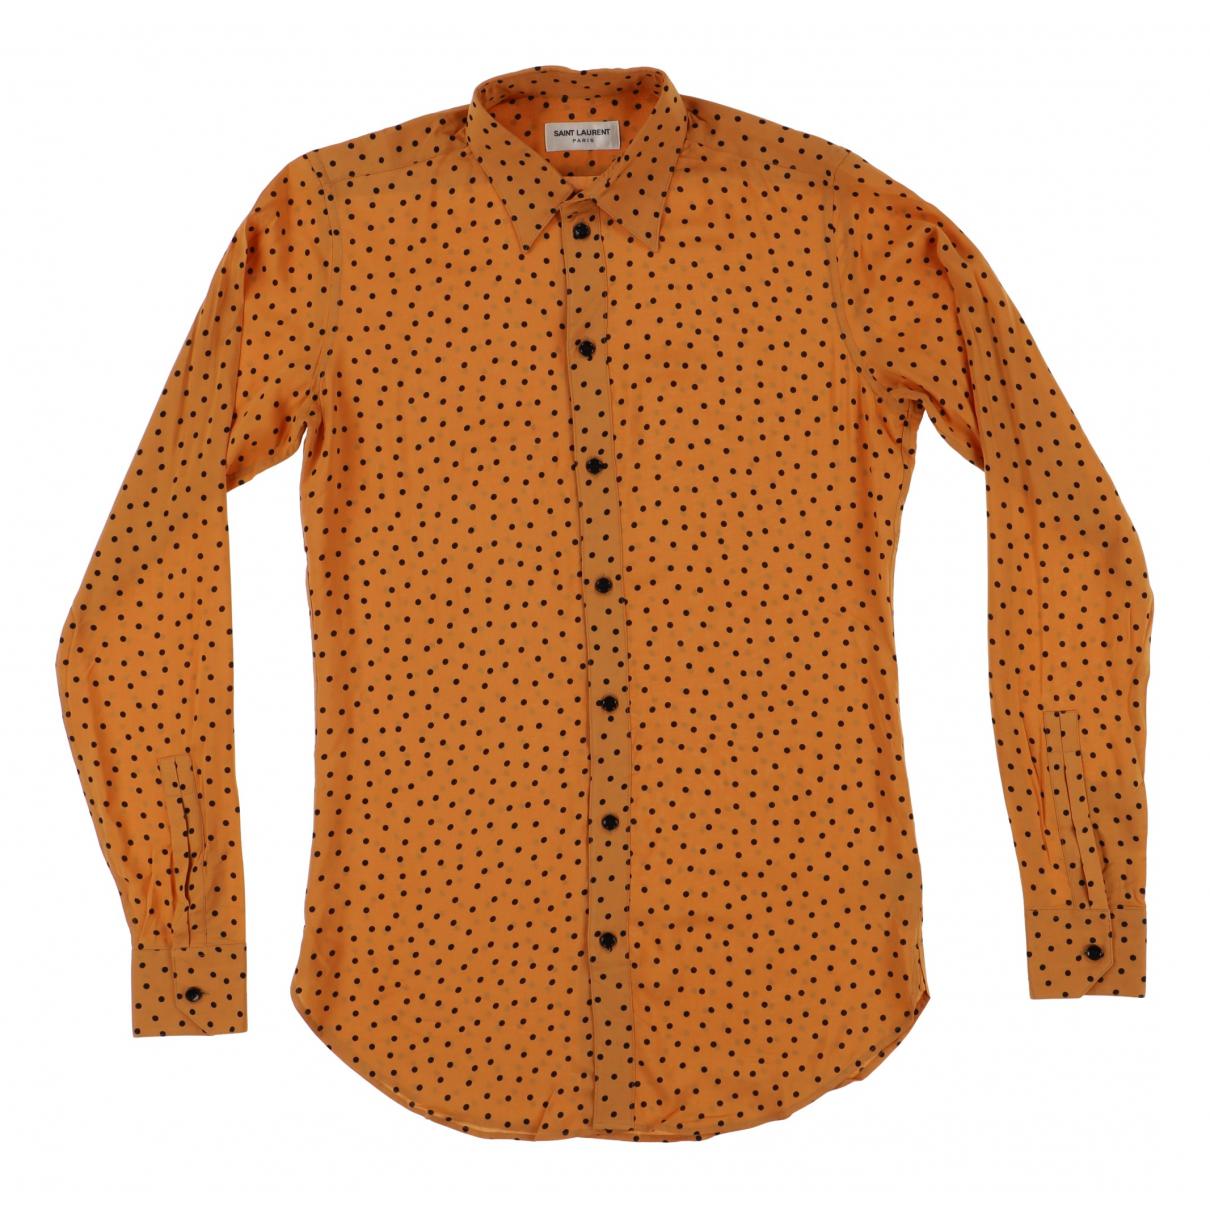 Camisas de Seda Saint Laurent